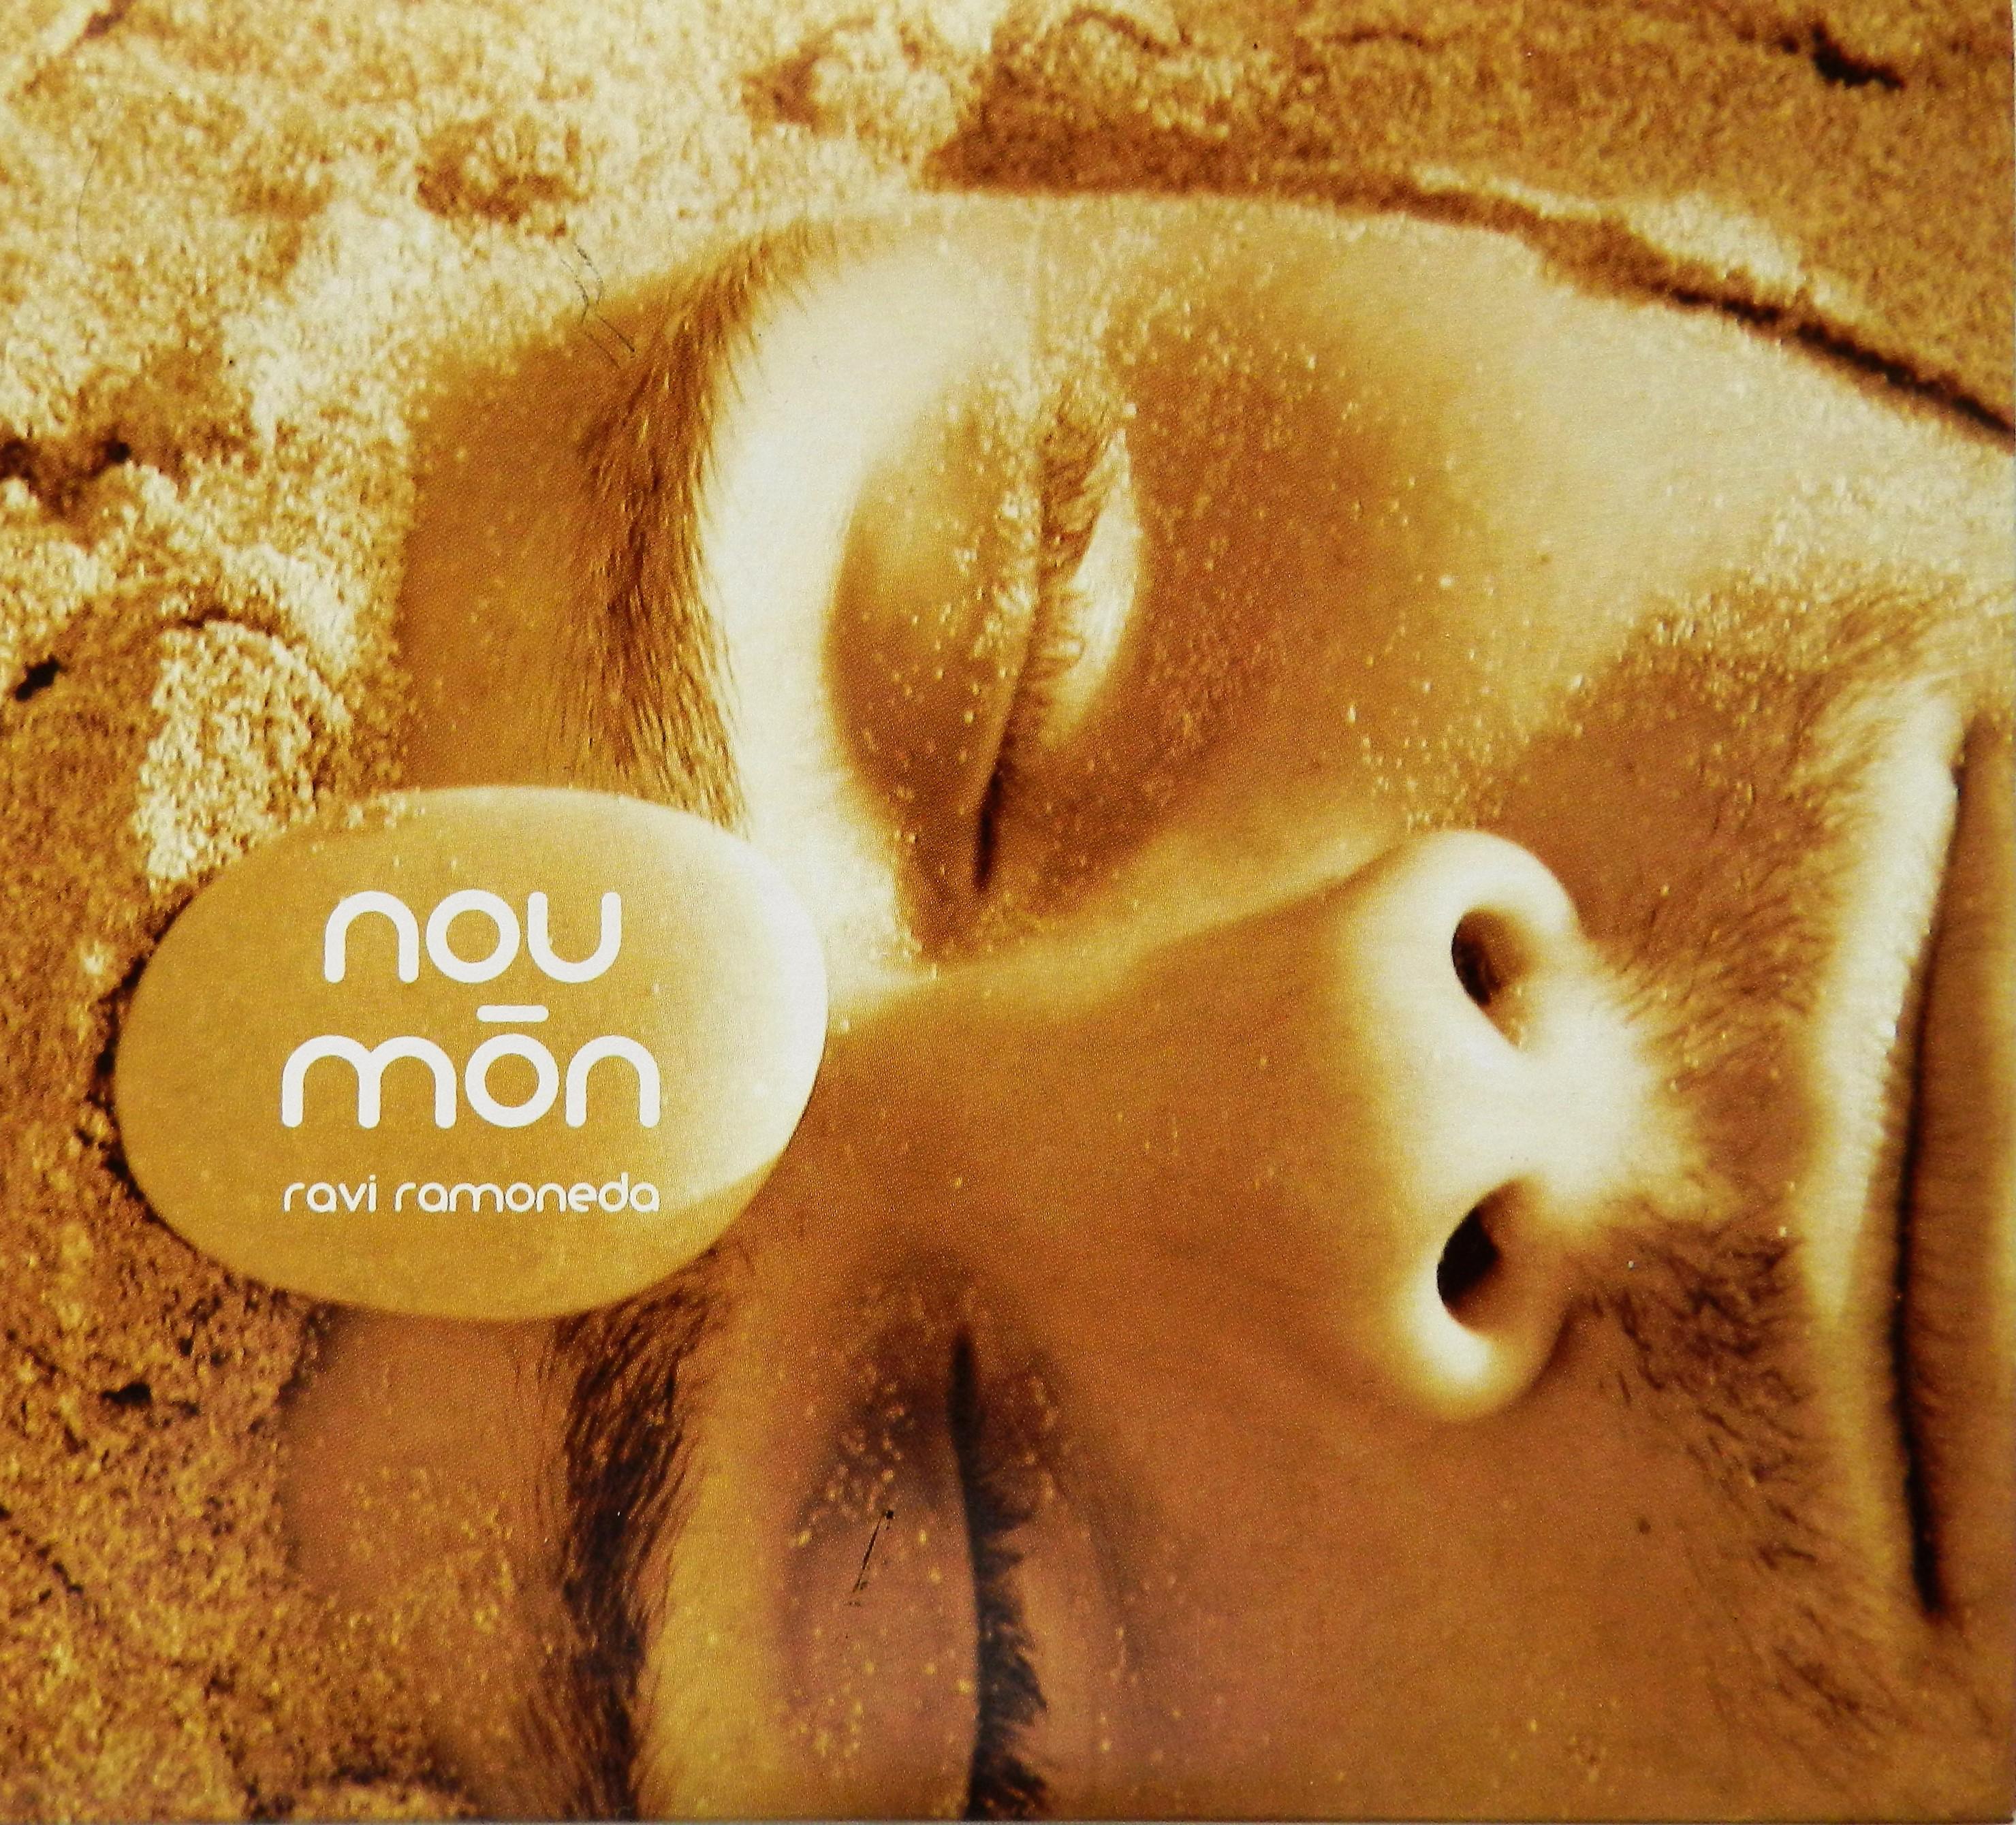 nou mon cd cover